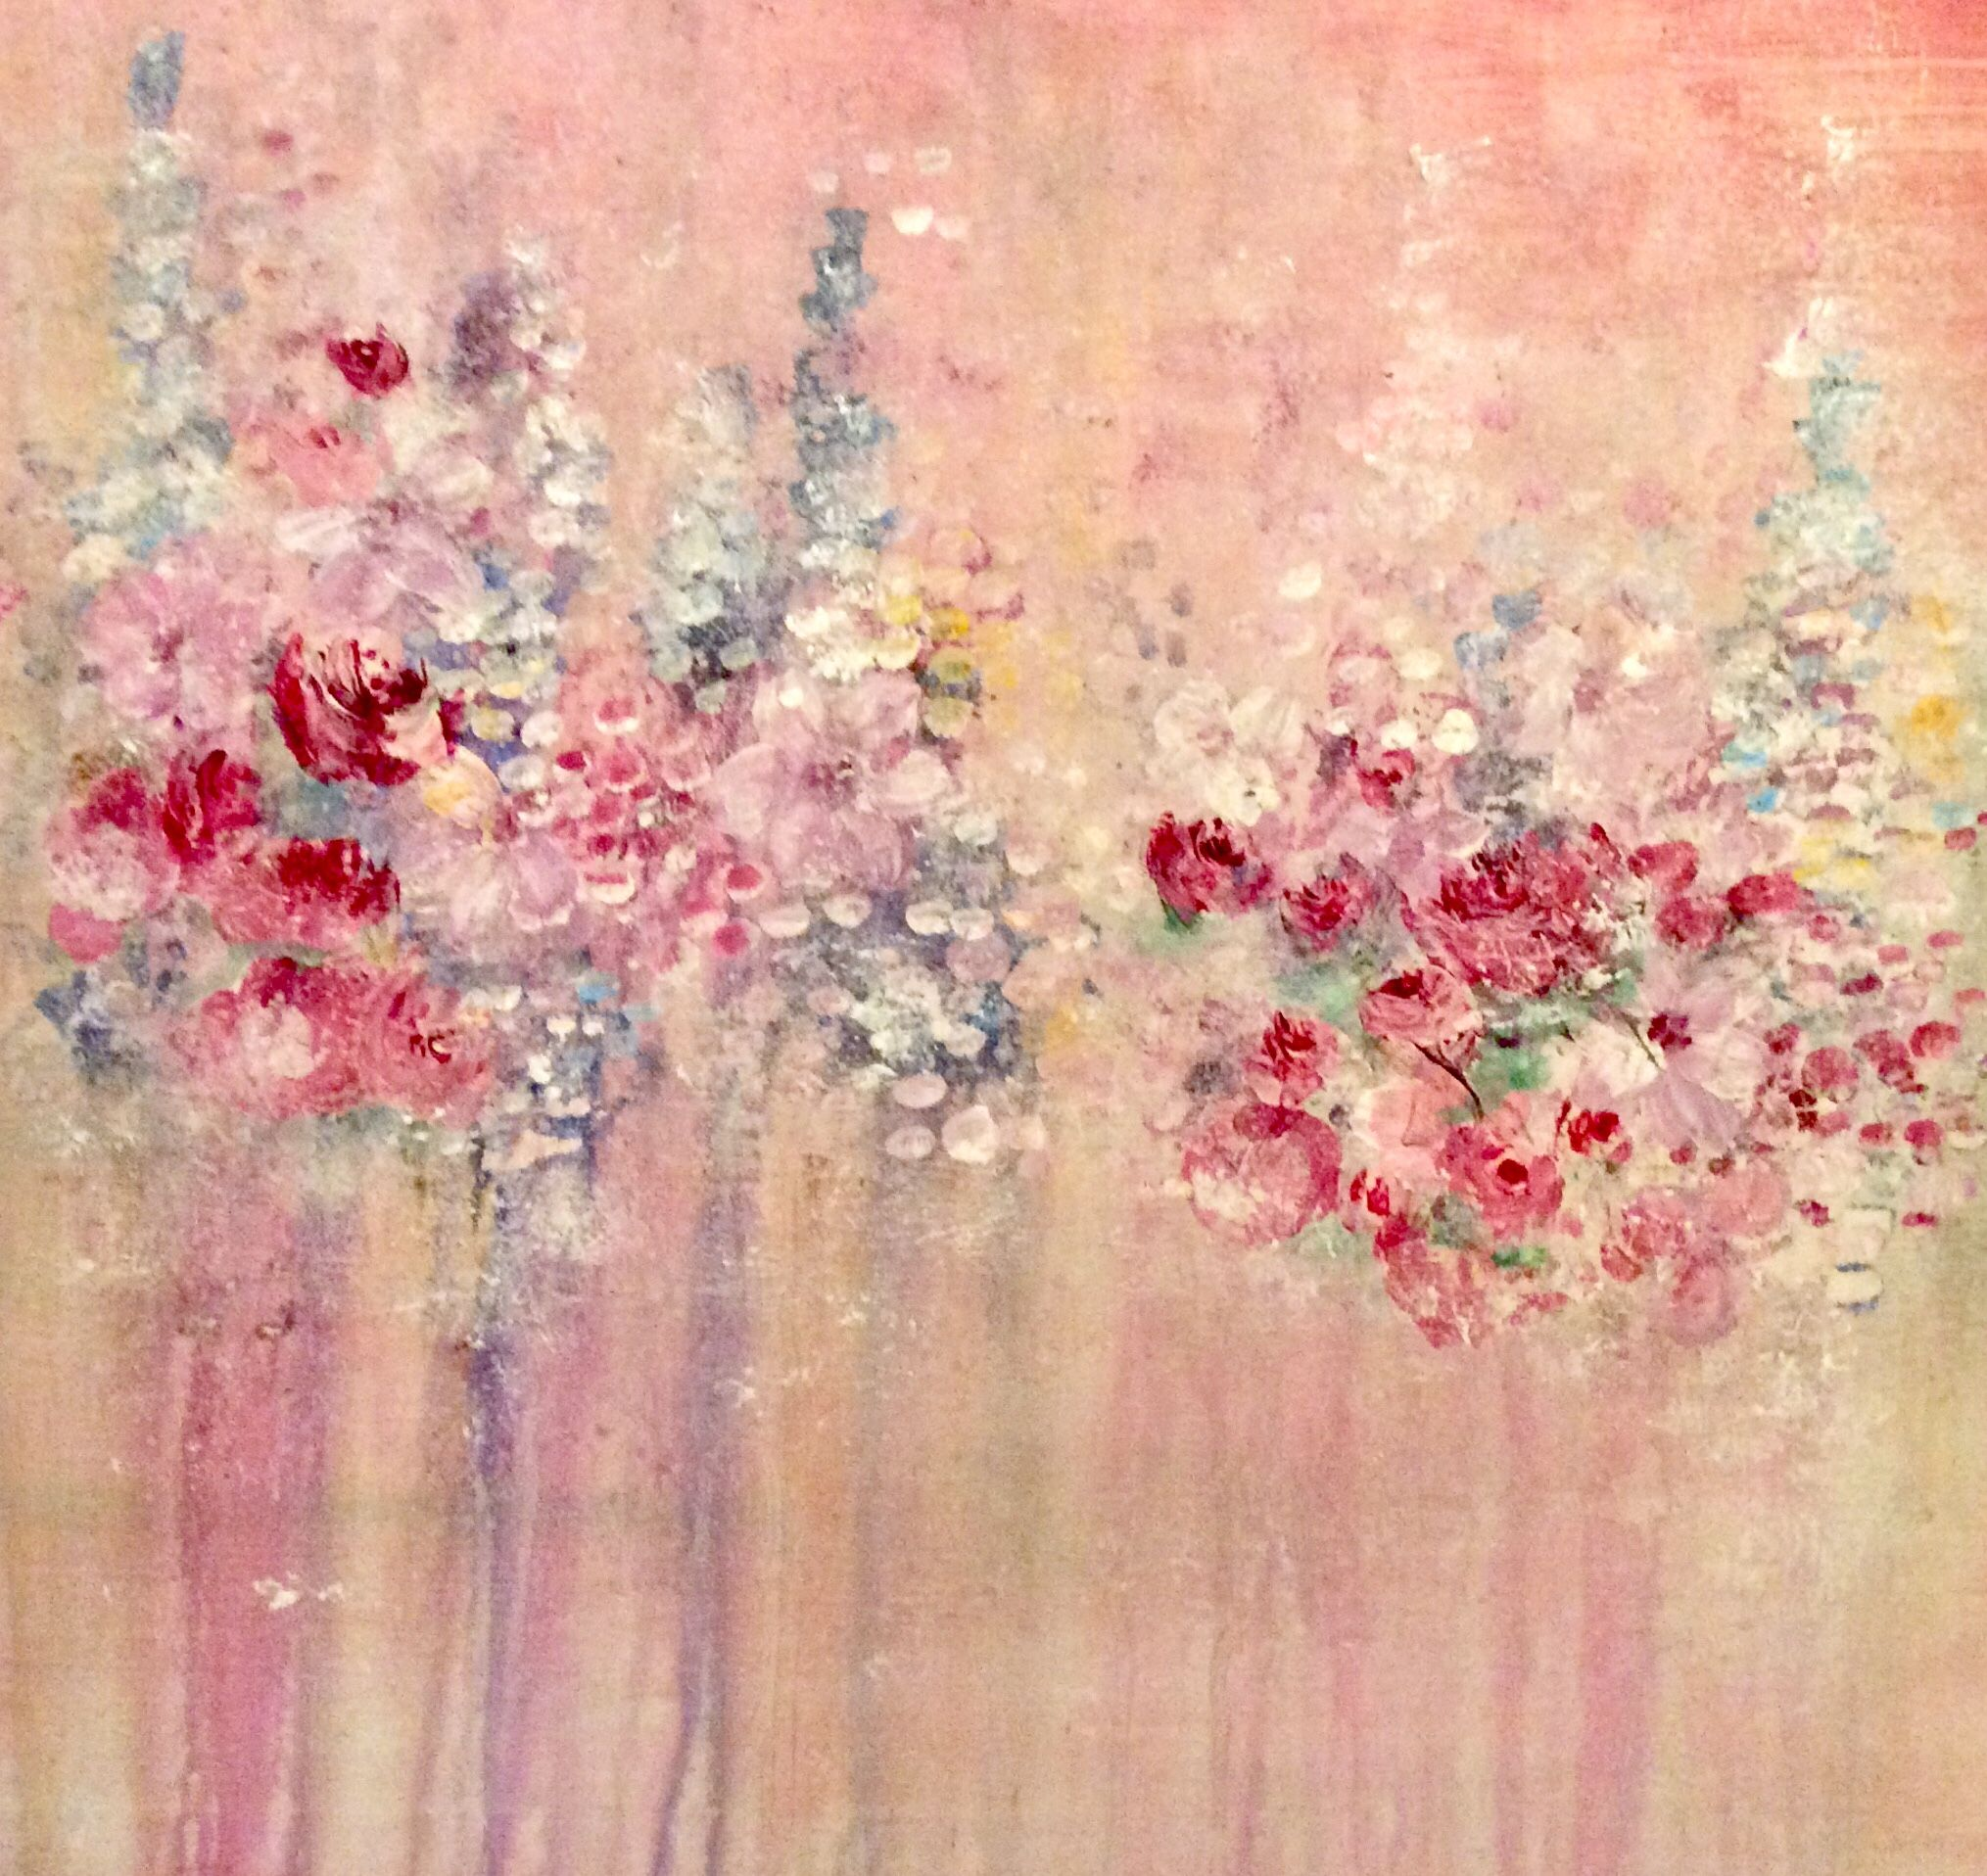 Connyartig Acryl Auf Leinwand Blumenwiese Abstrakt Romantisch Zart